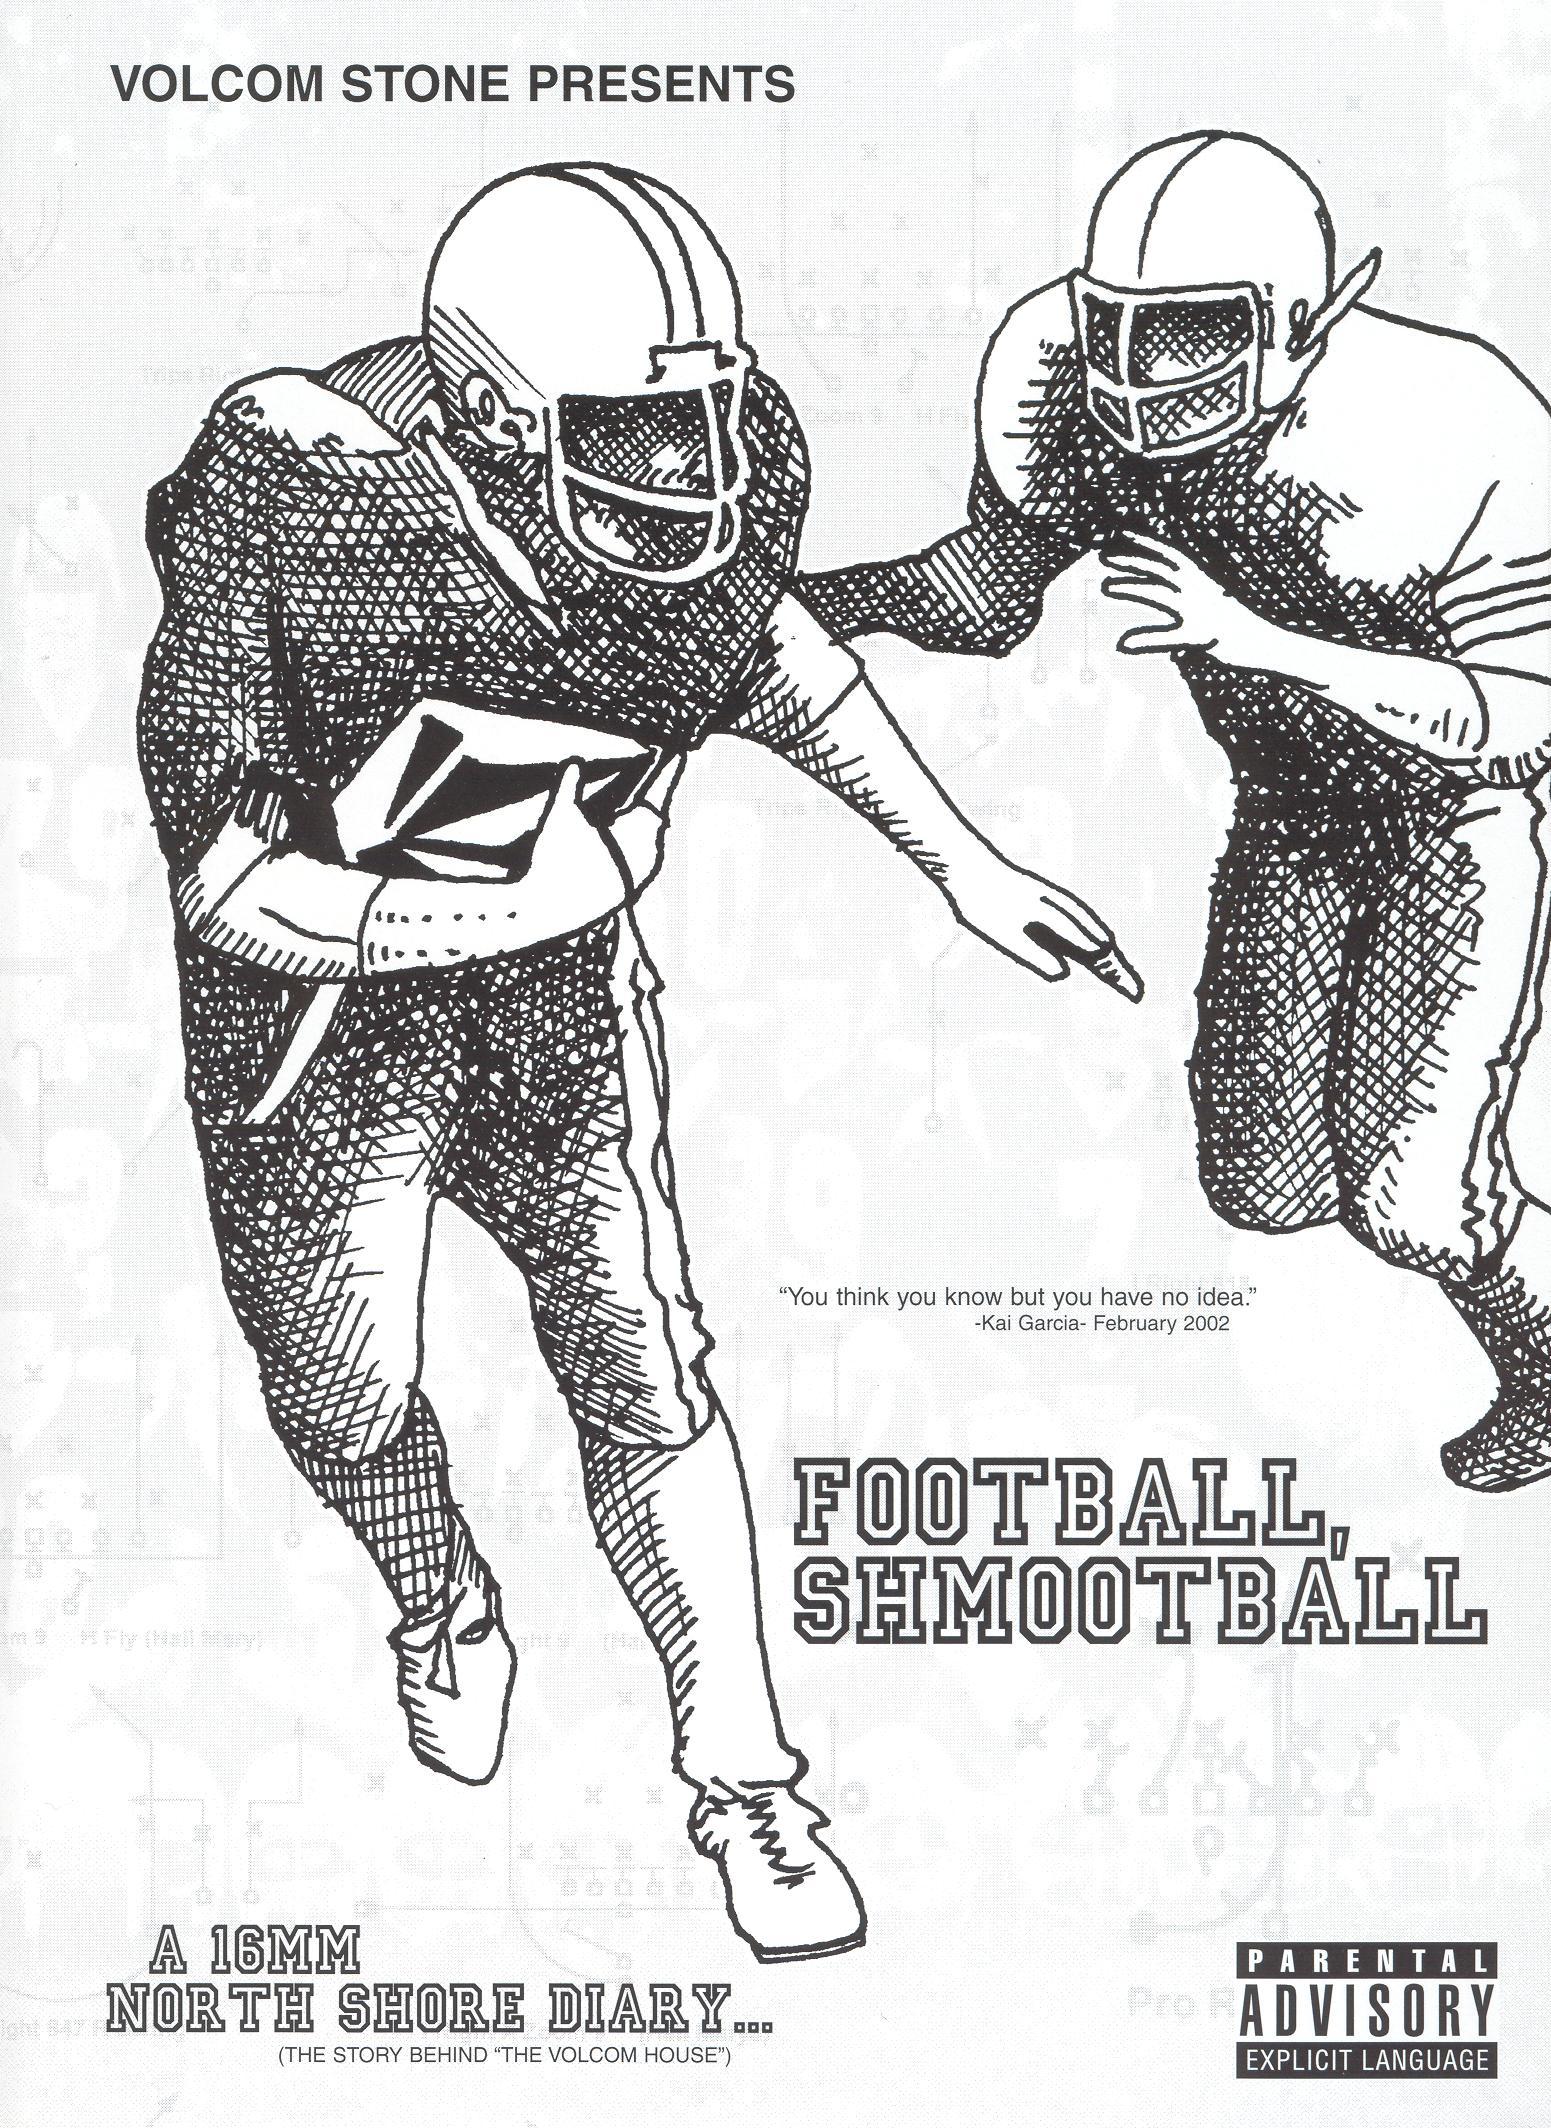 Football Schmootball